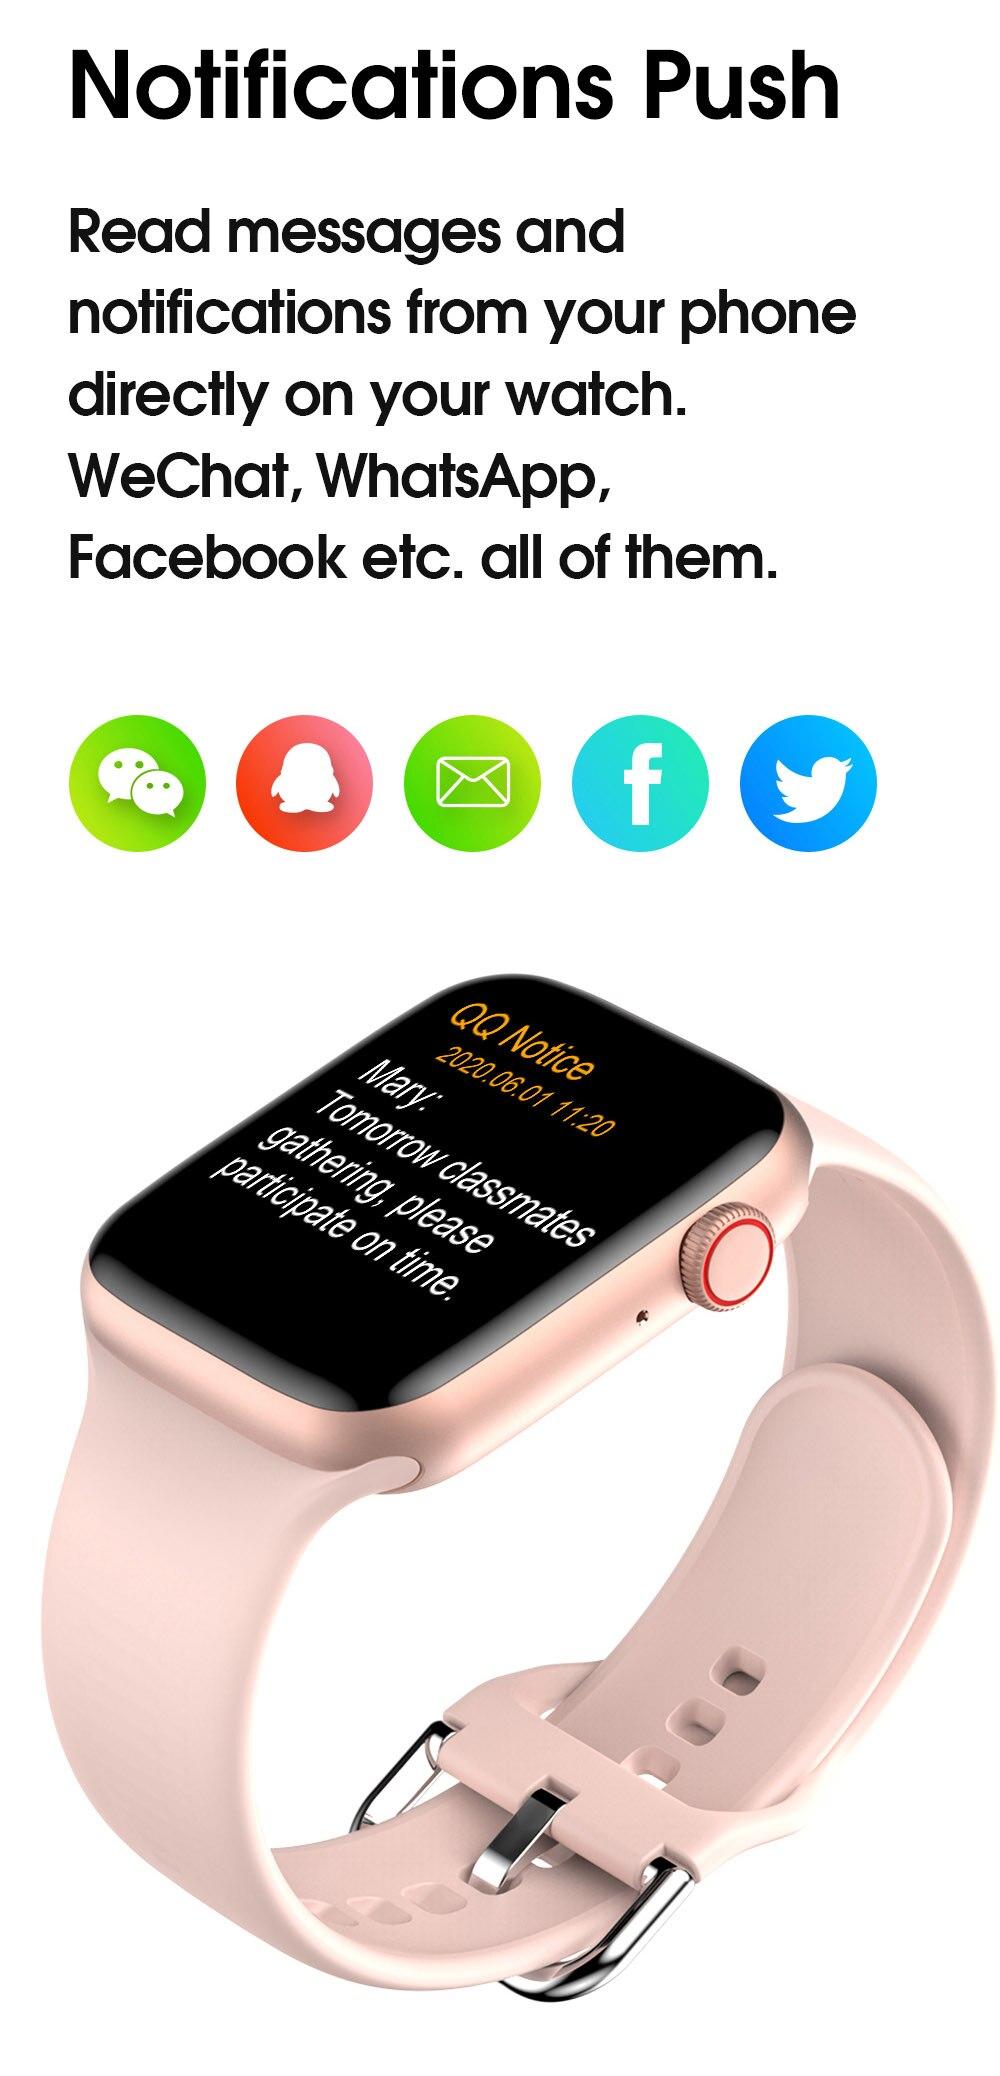 H0333f8bc5bbd47f89dcab079429754ceG TREZER IWO W26+ Pro Smart Watch 1.75 Inch 320*385 Series 6 IPS Full Touch Screen Custom Watch Face Smartwatch Men Women PK HW22